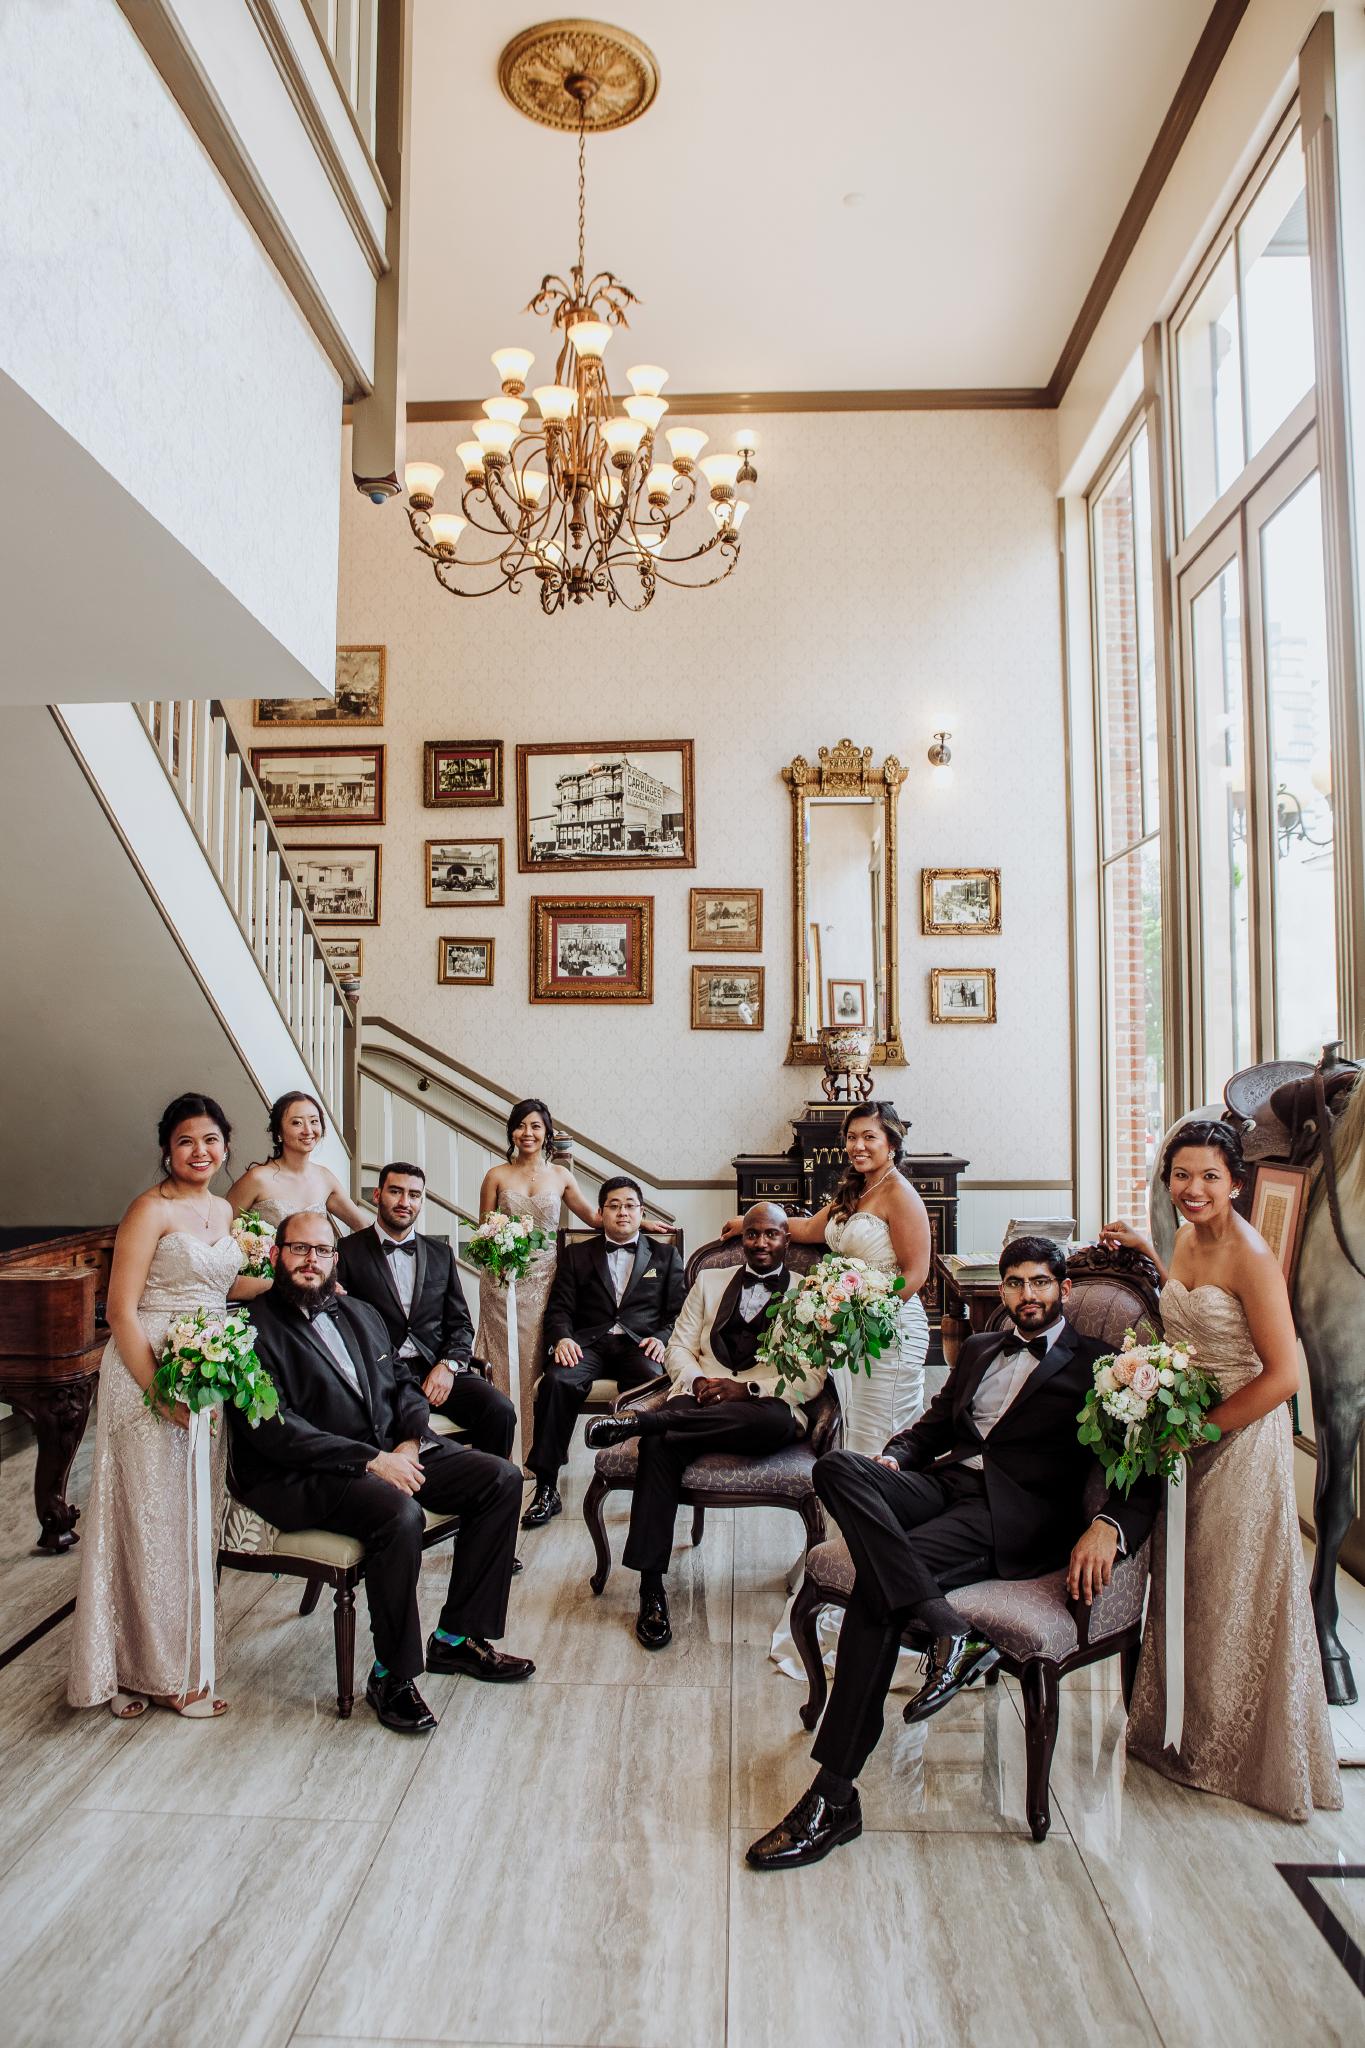 san diego wedding   photographer | group of men and women in wedding attire